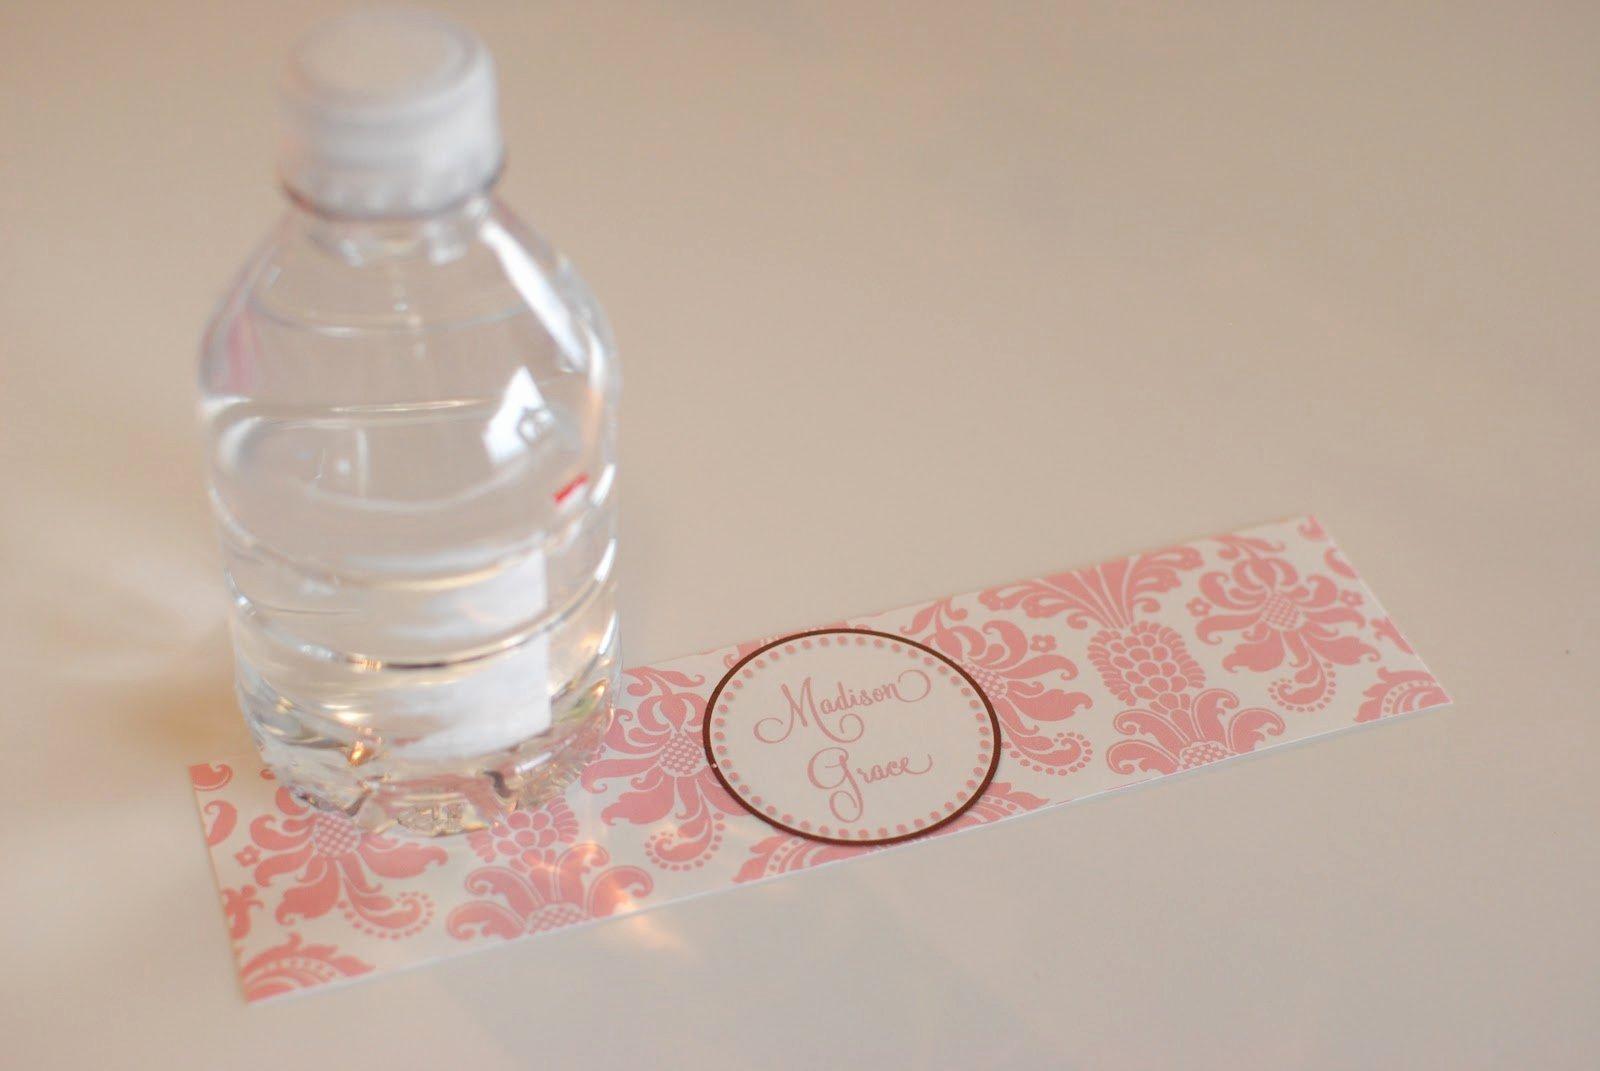 Water Bottle Labels Template Luxury Life Sweet Life Diy Printable Water Bottle Labels